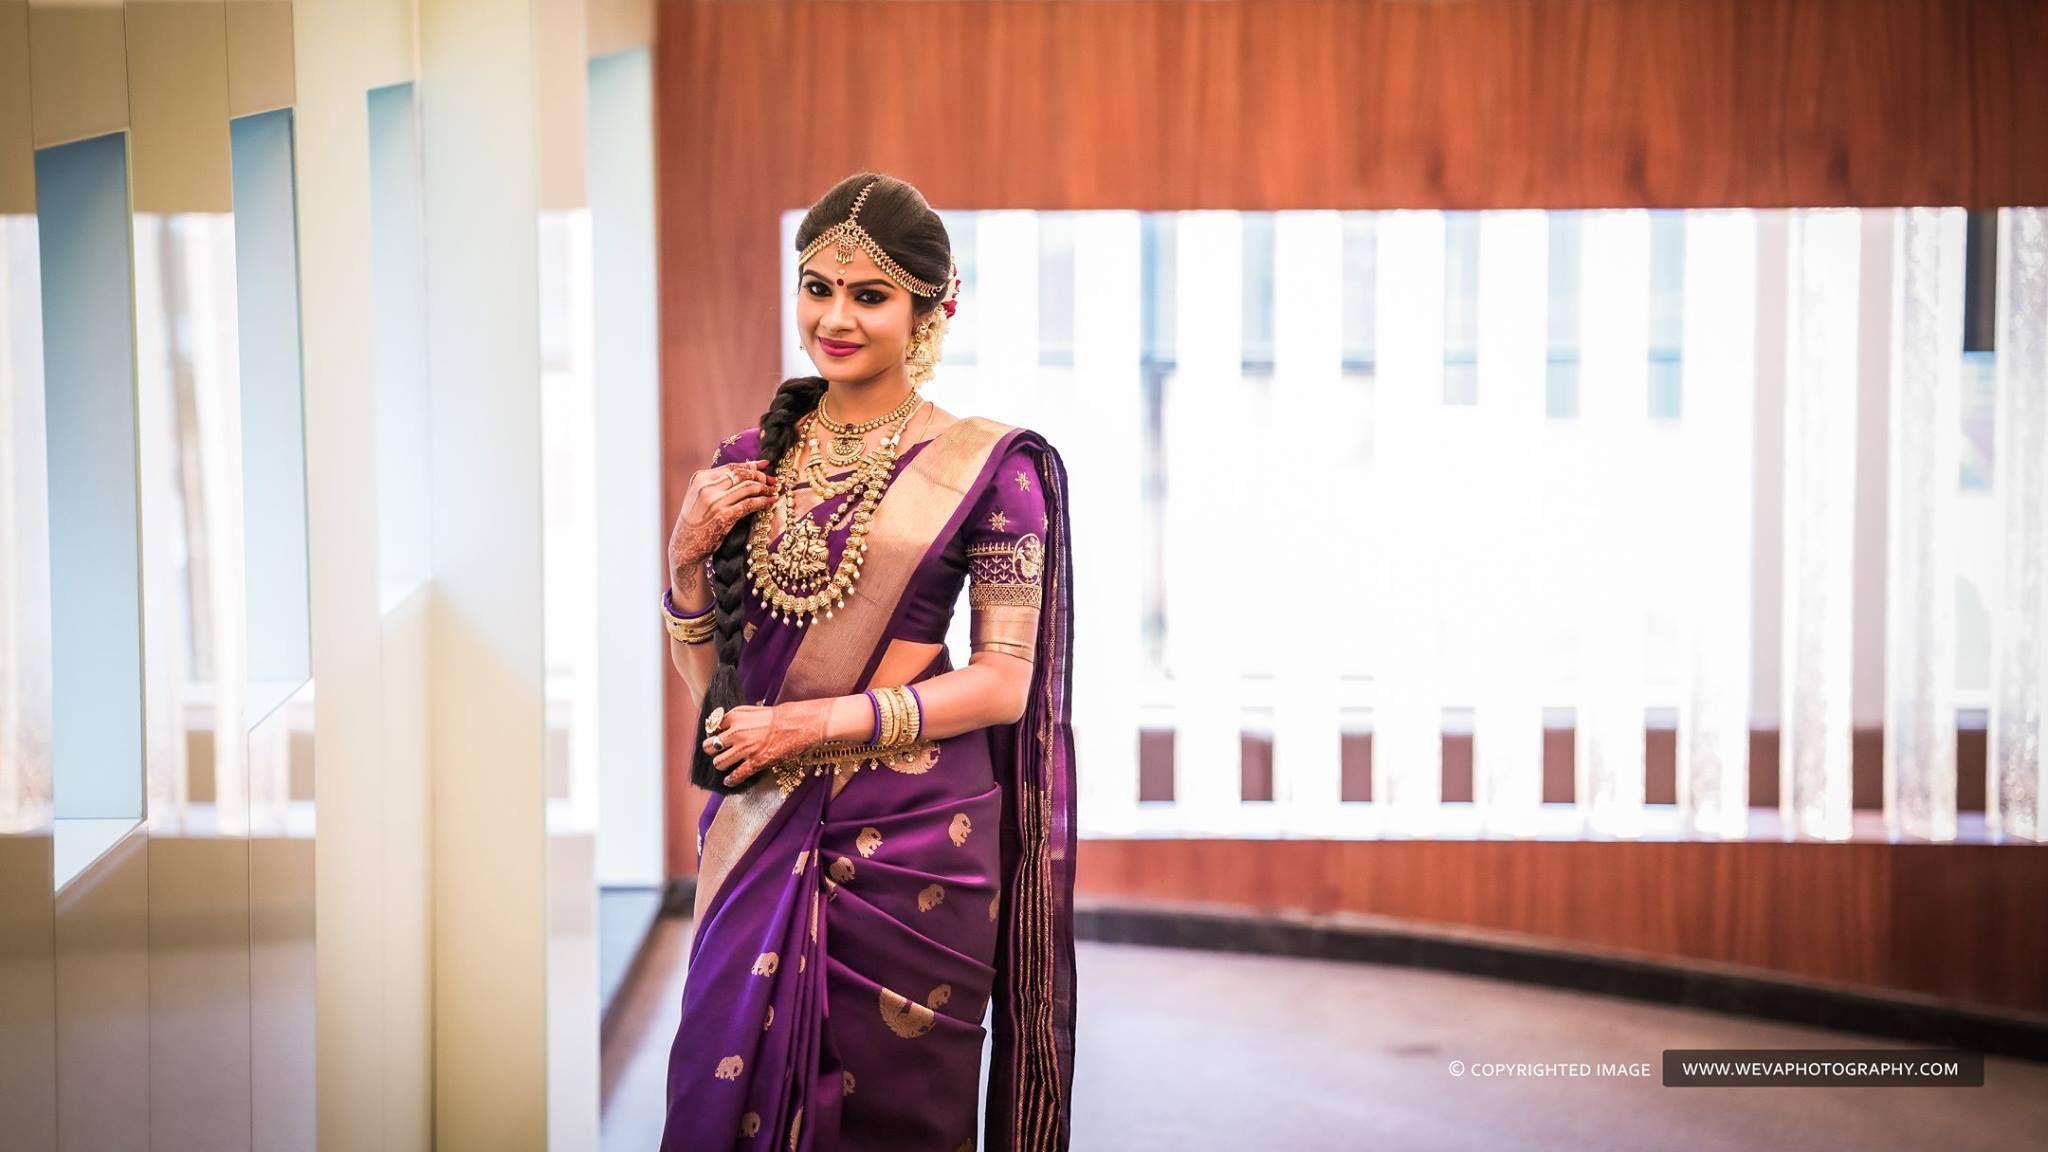 Pin by Shyanthy Thevarajah on Tamil Bridal Makeup | Pinterest ...